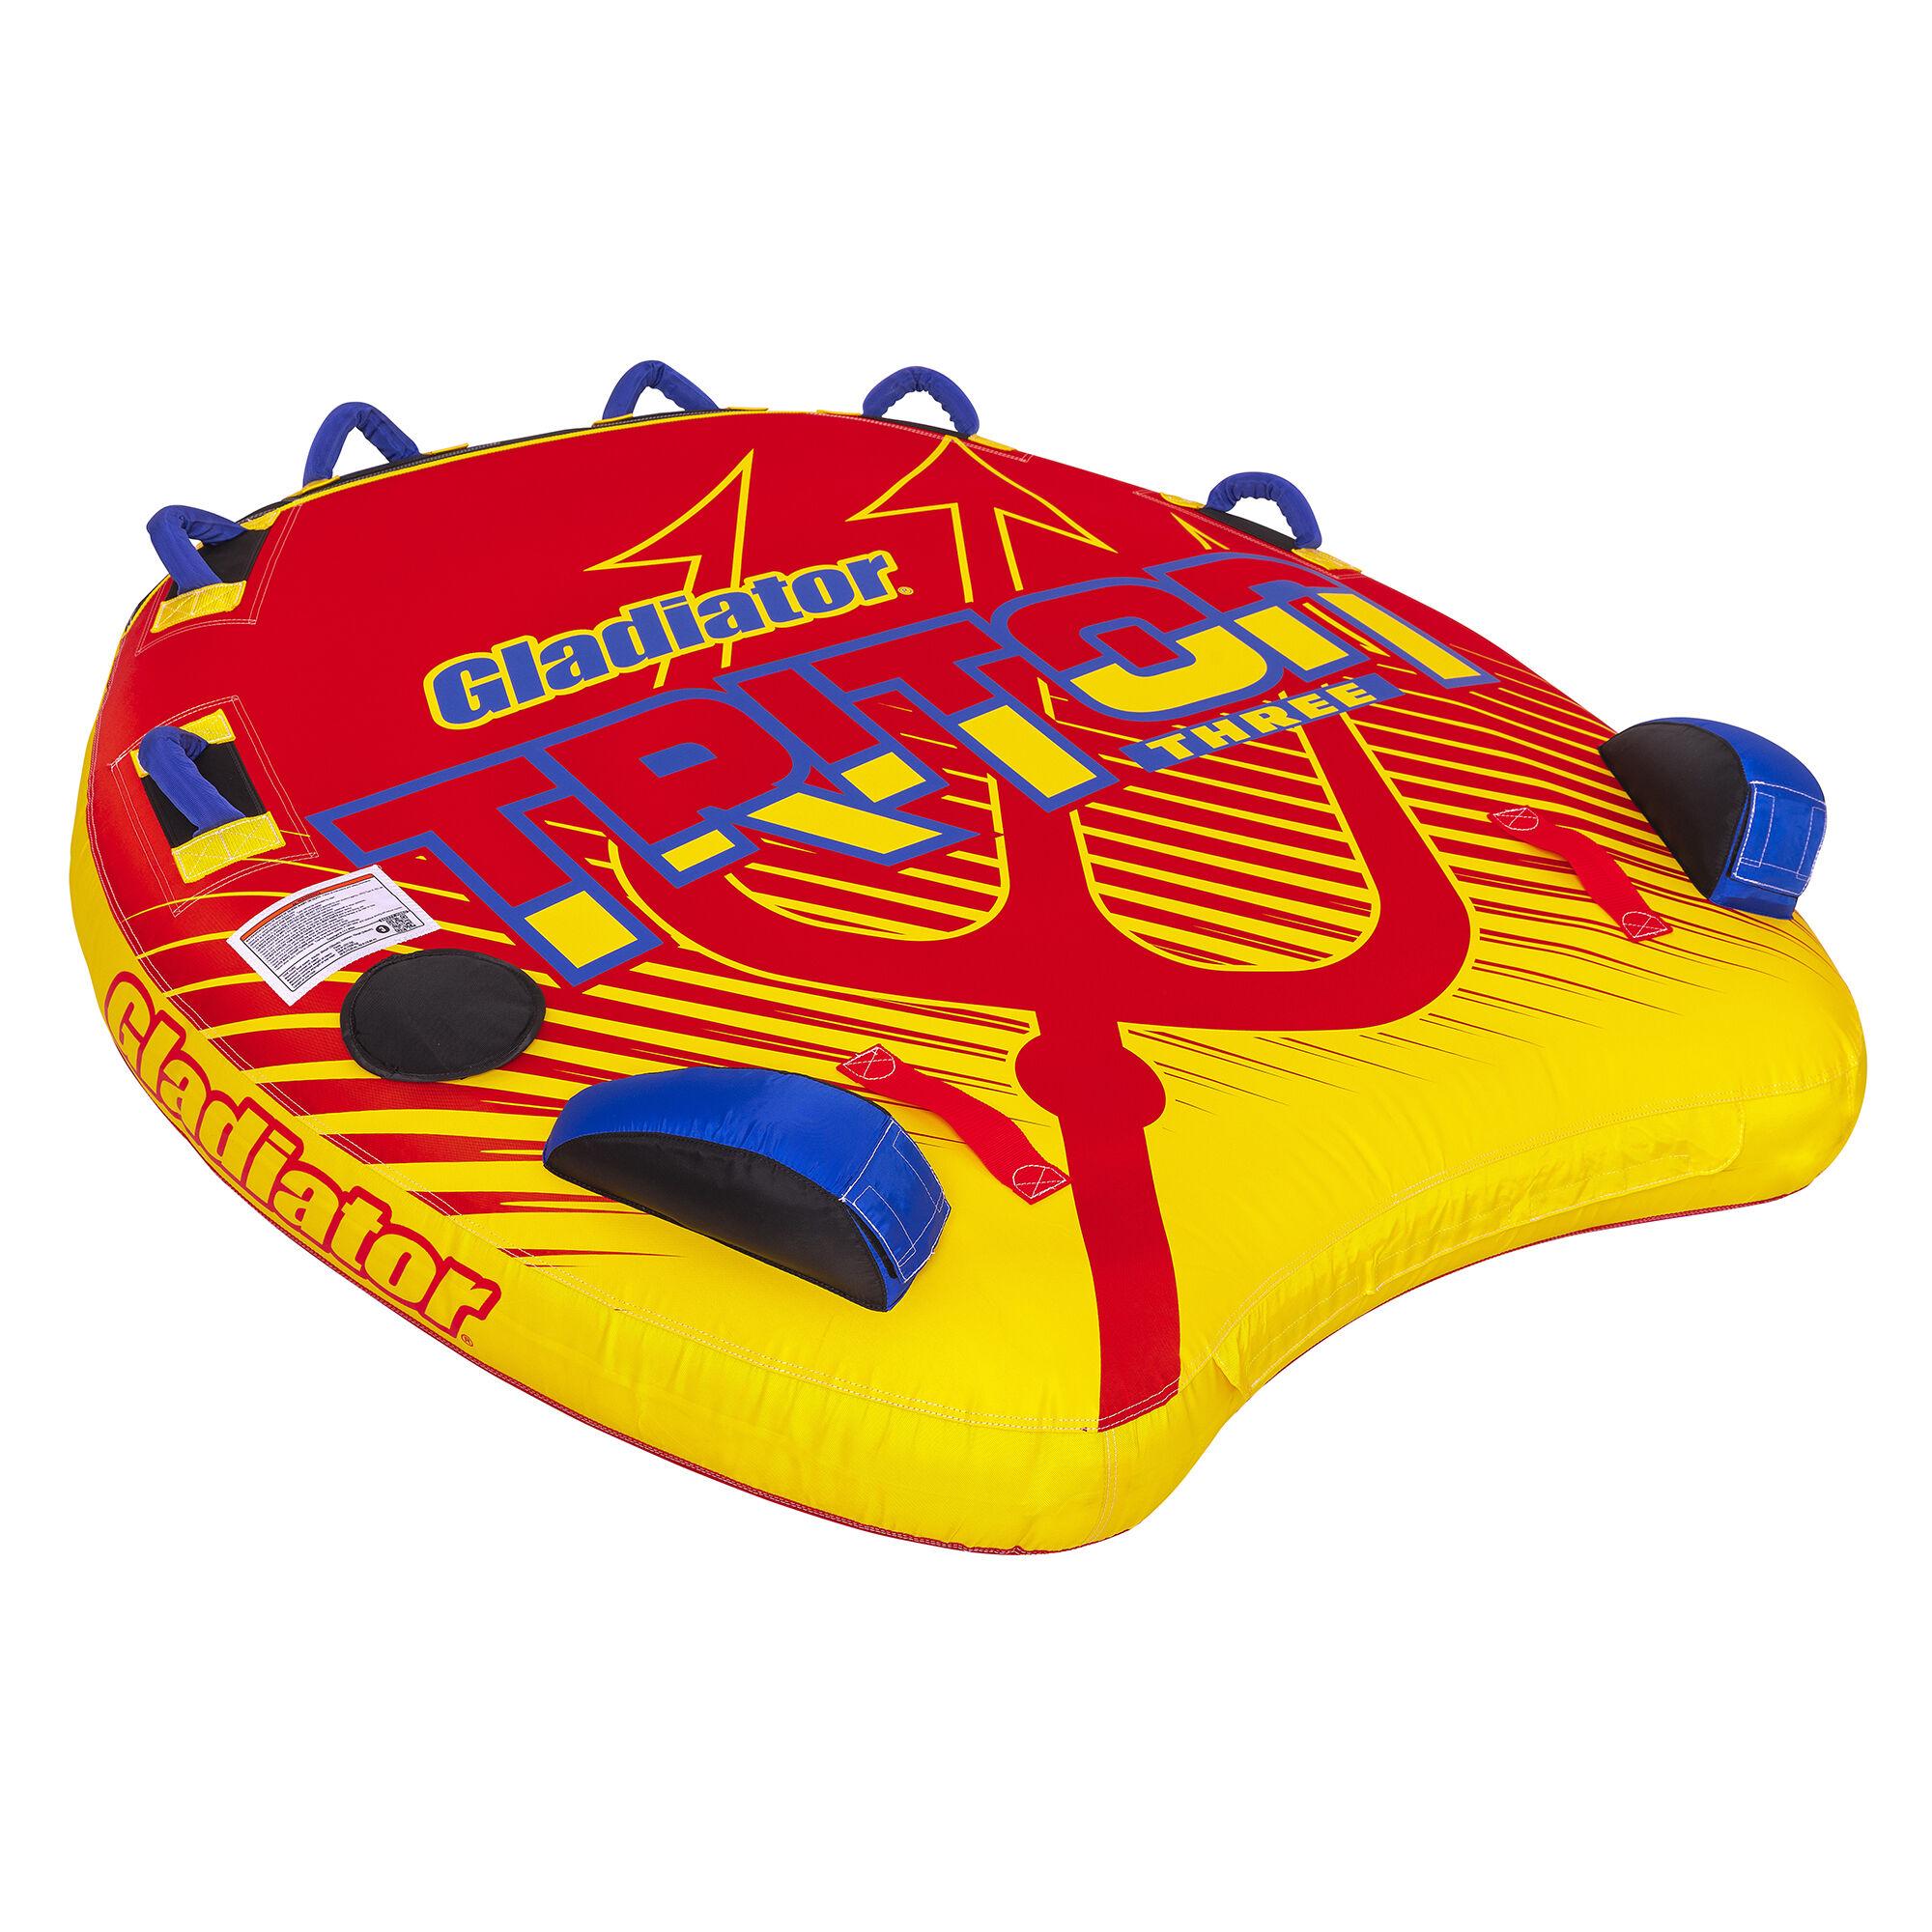 Blackbird Redwing Phantom Float 6.0gr 2 2pack Red Top